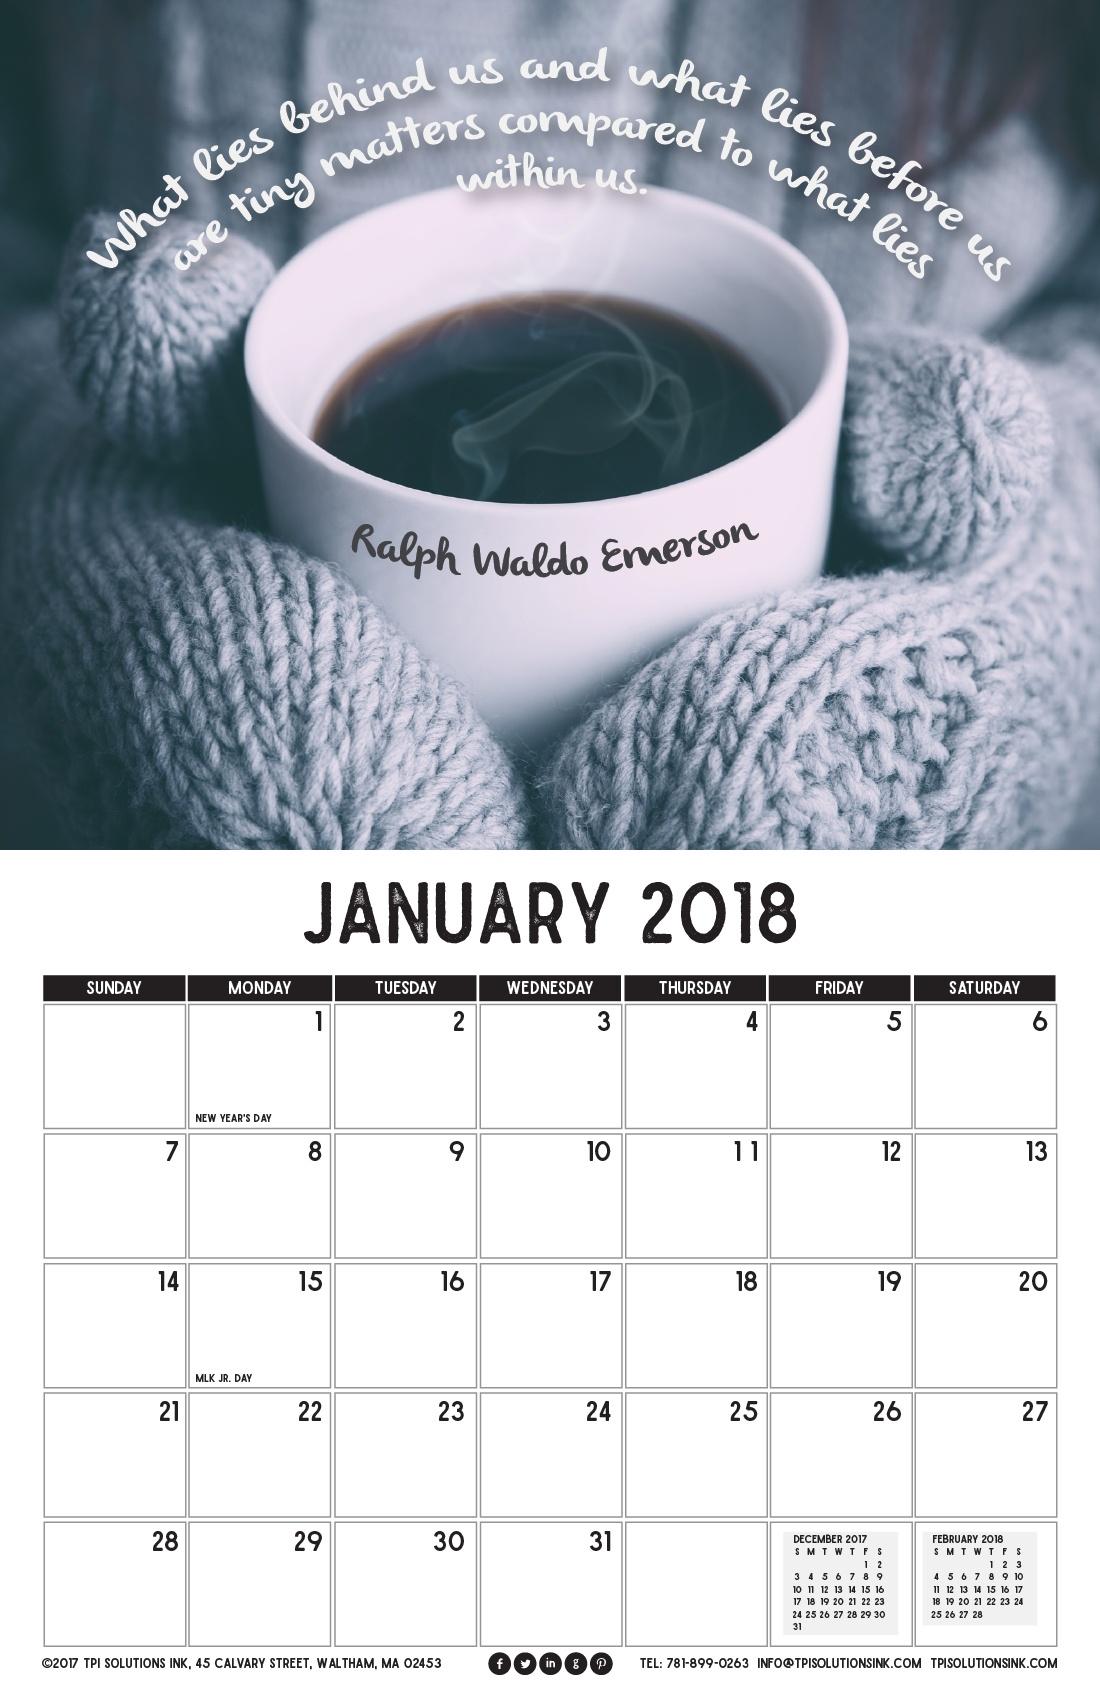 January 2018 Free Calendar Download - Printable